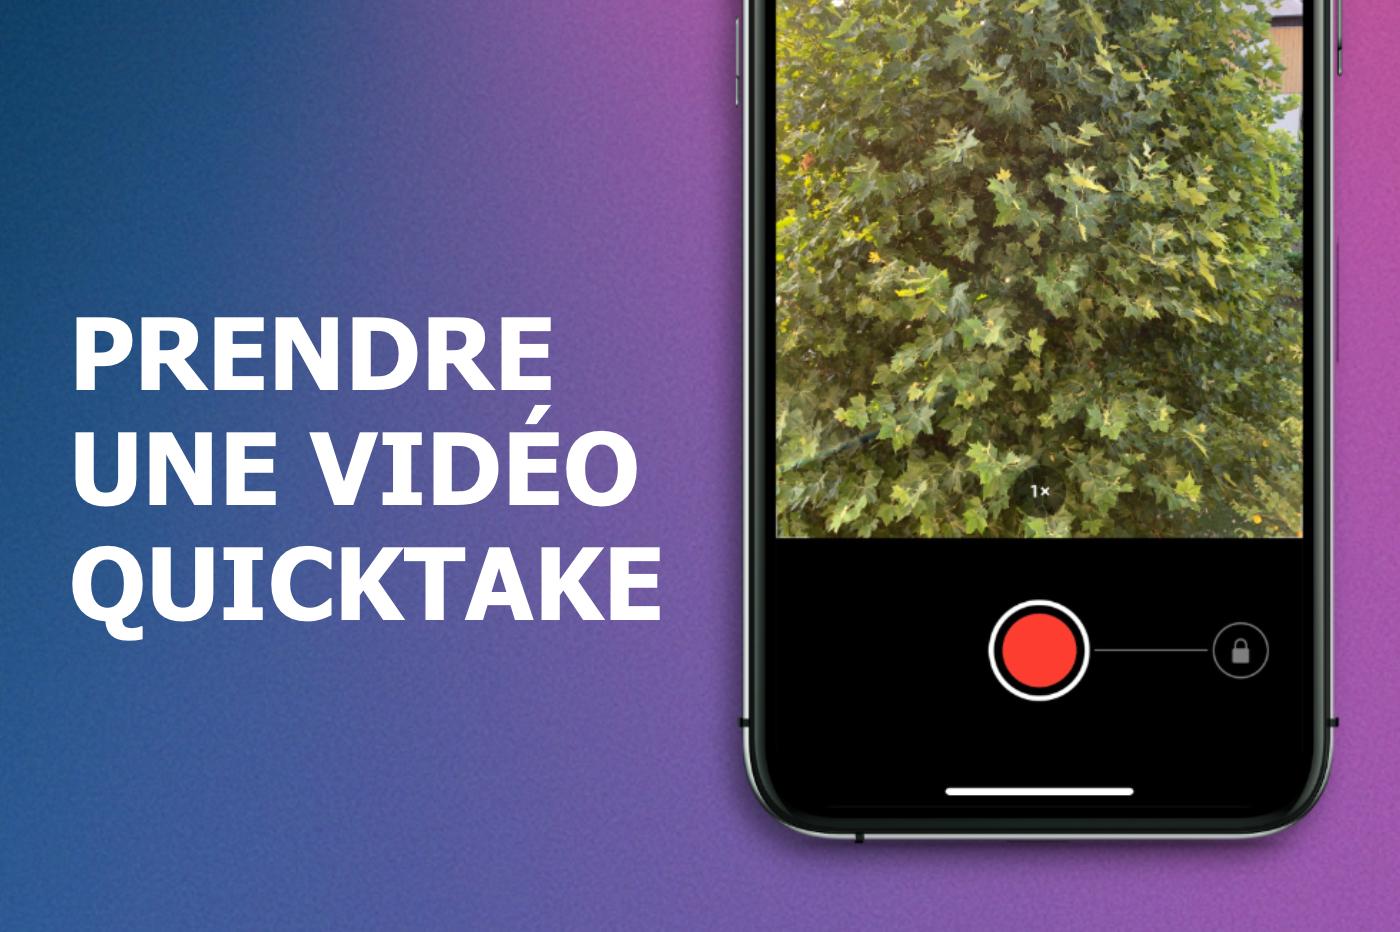 Prendre une vidéo QuickTake